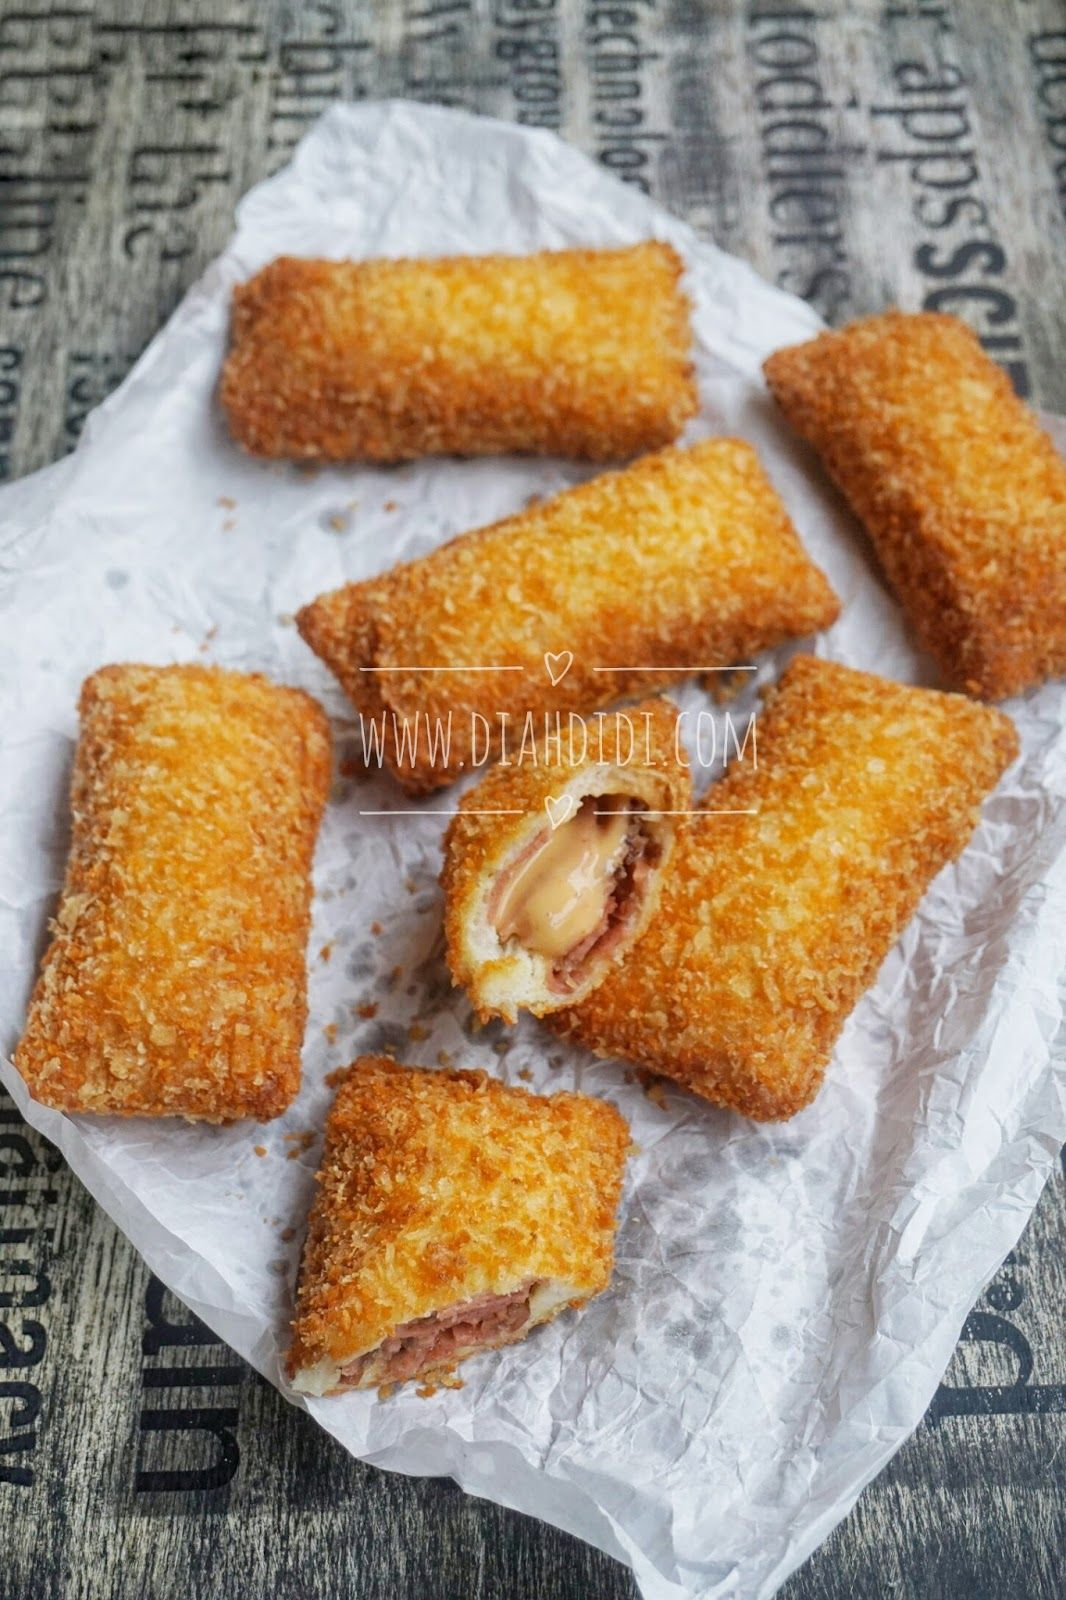 Roti Tawar Isi : tawar, Didi's, Kitchen:, Tawar, Goreng, Daging, Makanan,, Makanan, Minuman,, Resep, Masakan